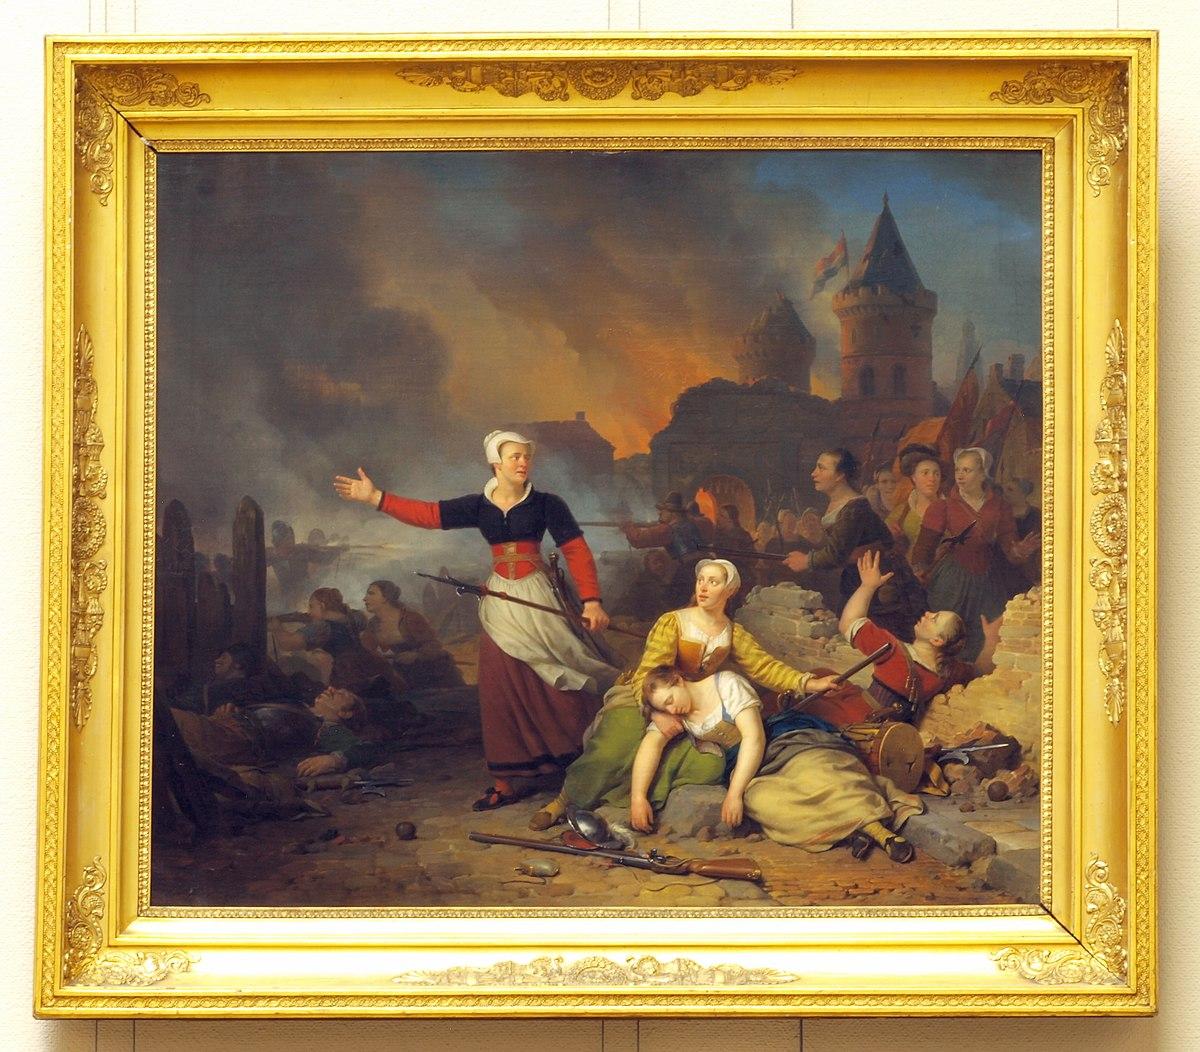 http://upload.wikimedia.org/wikipedia/commons/thumb/3/32/Ferdinand_de_Braekeleer_(1792-1883)%2C_Kenau_Simonsdr._Hasselaar_tijdens_het_belg_van_Haarlem%2C_1829%2C_Olievrf_op_doek.JPG/1200px-Ferdinand_de_Braekeleer_(1792-1883)%2C_Kenau_Simonsdr._Hasselaar_tijdens_het_belg_van_Haarlem%2C_1829%2C_Olievrf_op_doek.JPG